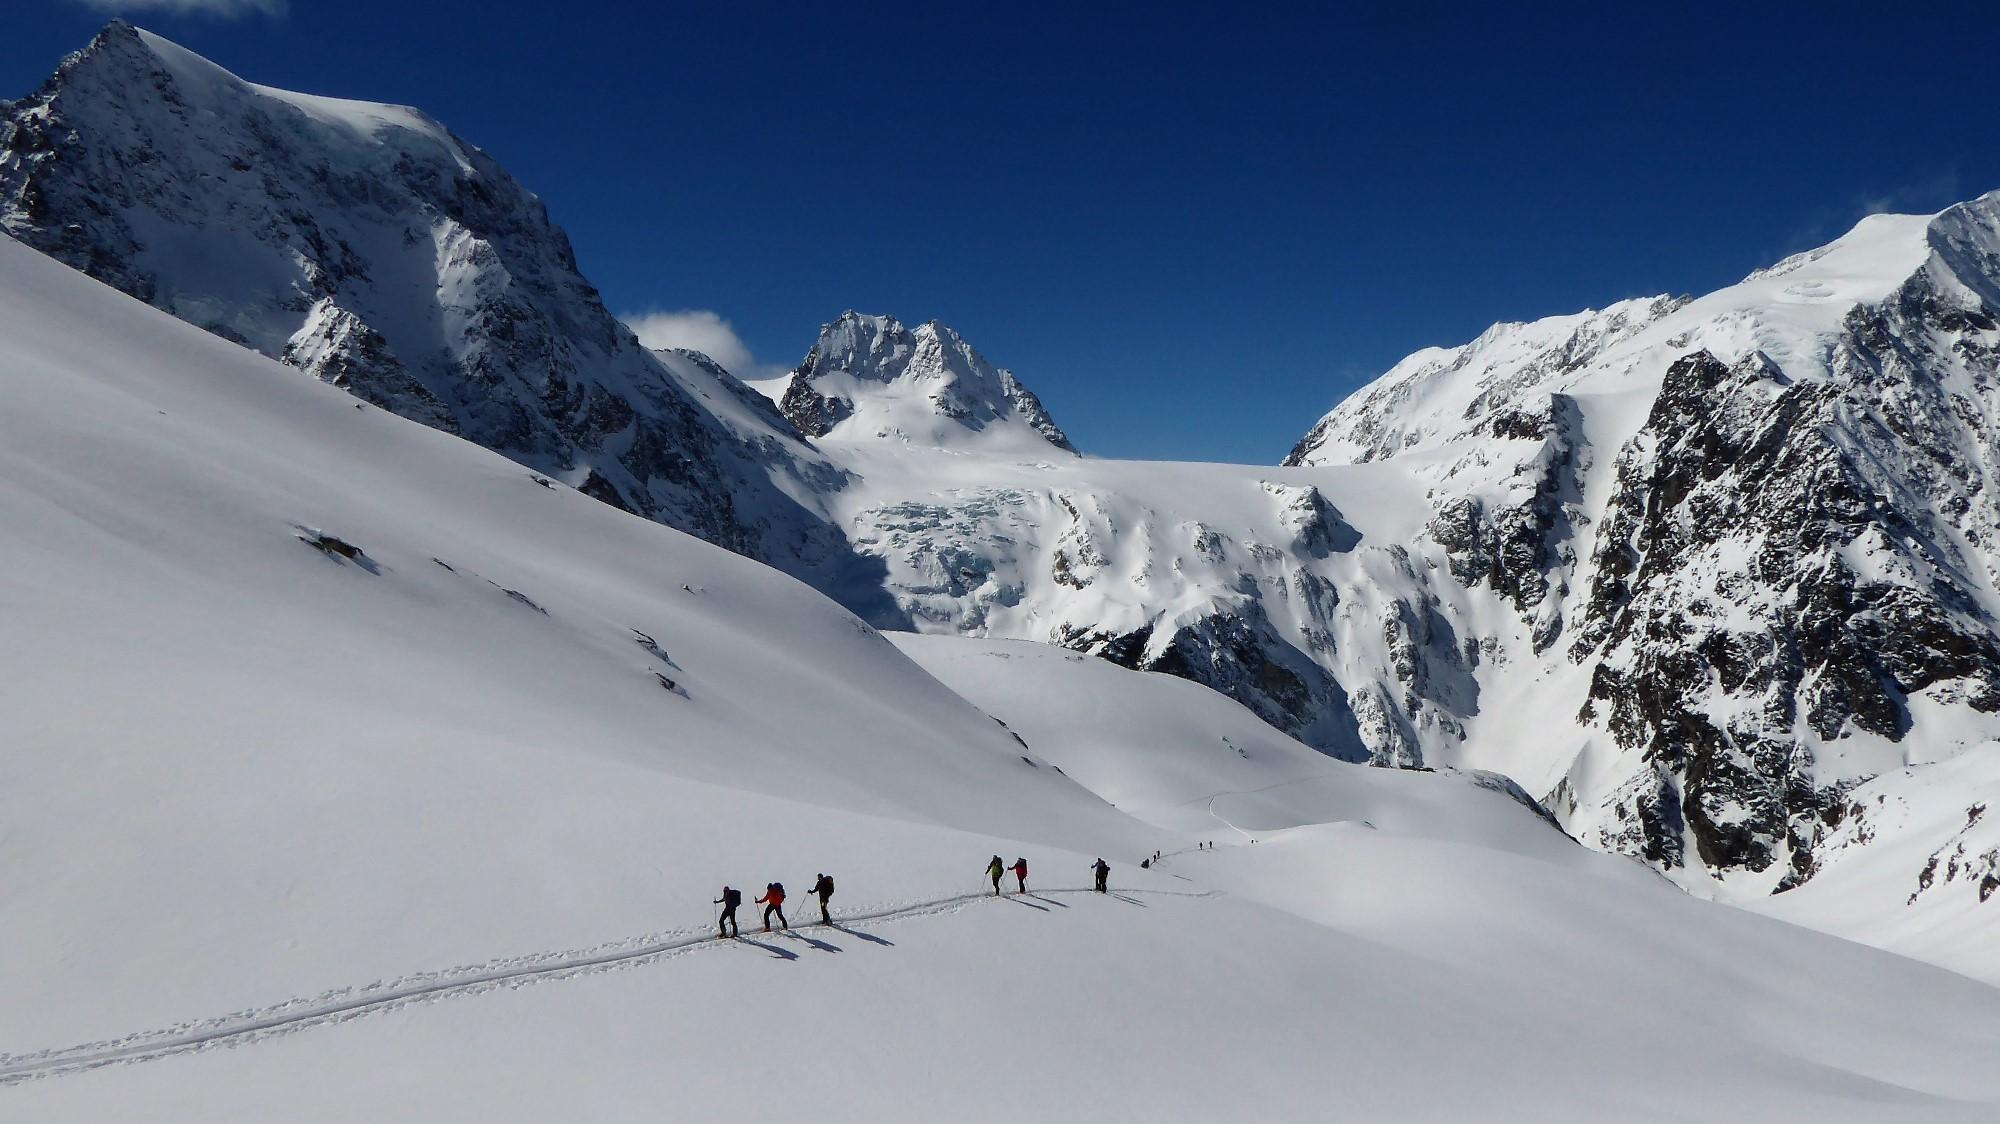 Med mogočnimi gorami, znamenita Haute Route. V ozadju Mont Collon (3637 m), Petit Mont Collon (3556 m) in Pigne d'Arolla (3796 m).